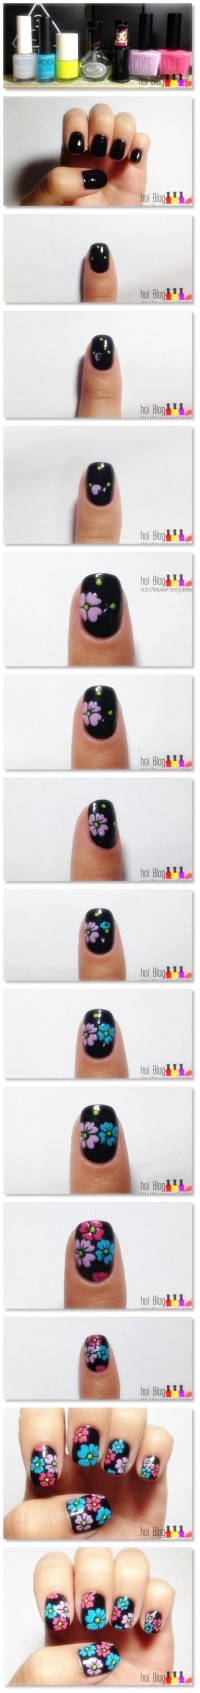 Nail Art_flower pattern